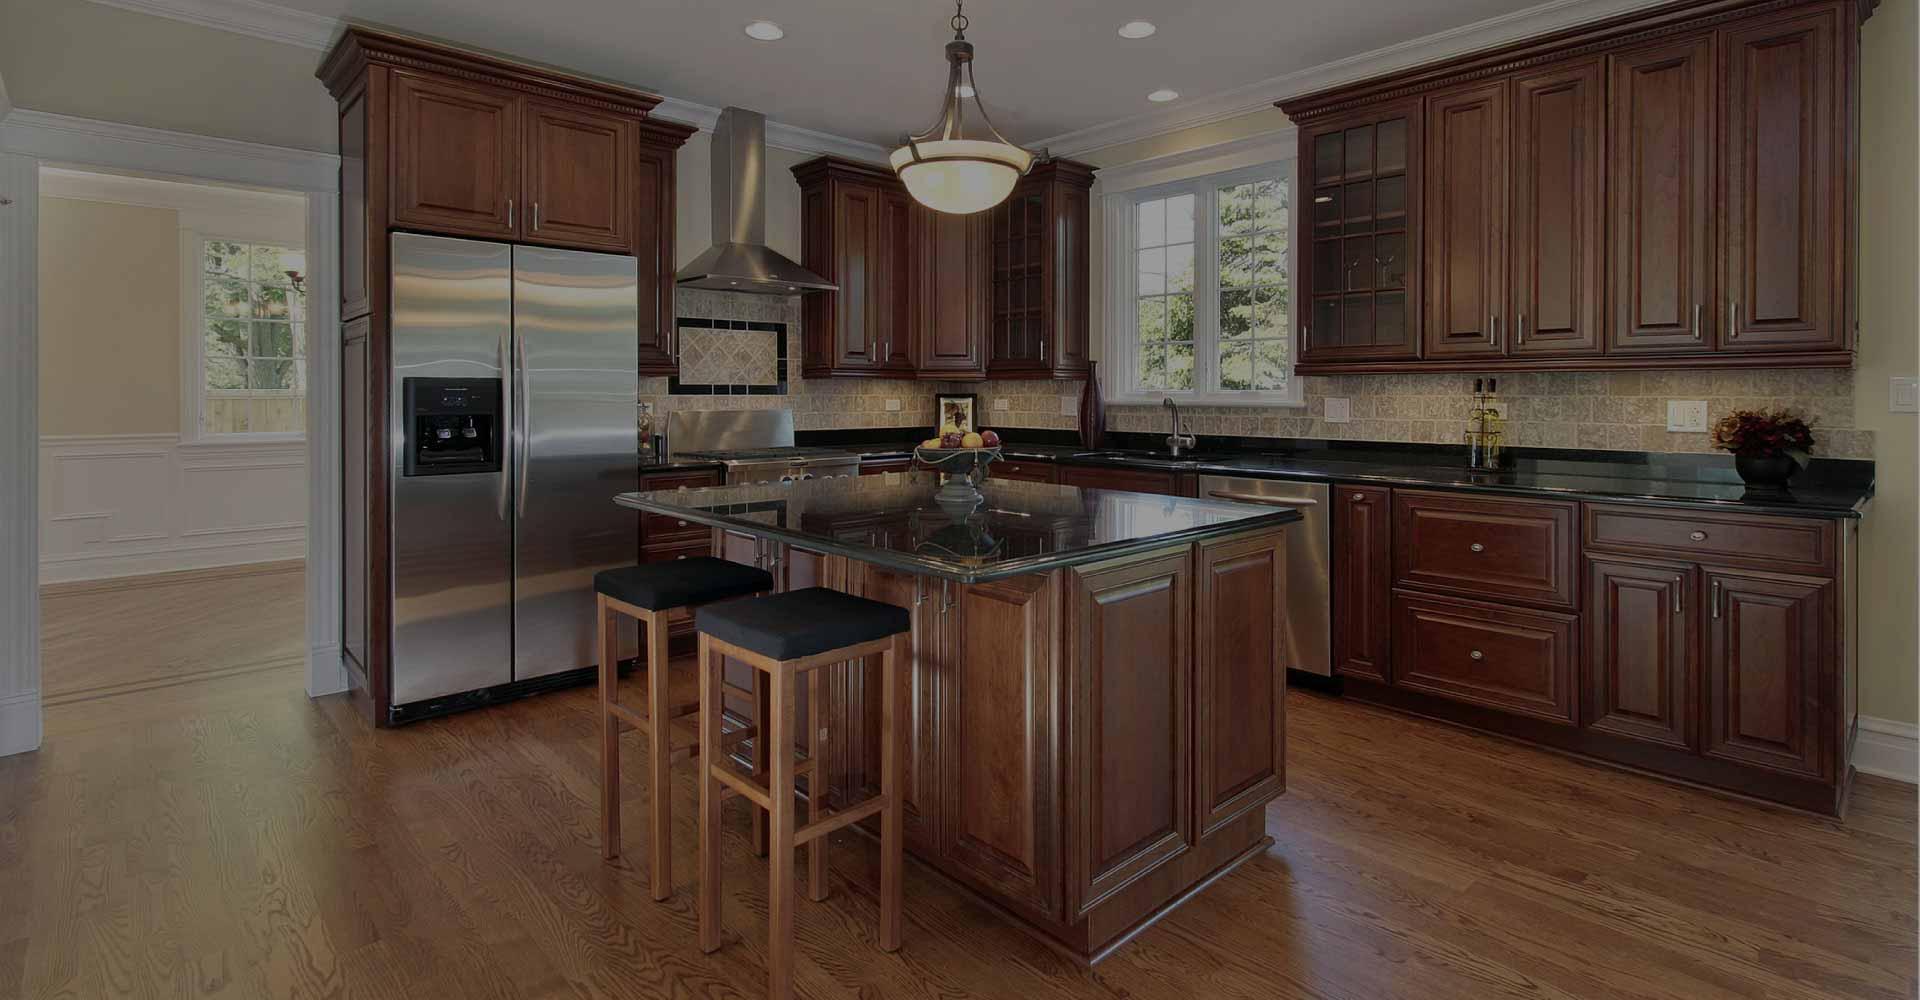 LOCAL In Elkridge MD Crofton MD 410 540 9333 Granite Countertops   United Granite  Countertops In Maryland